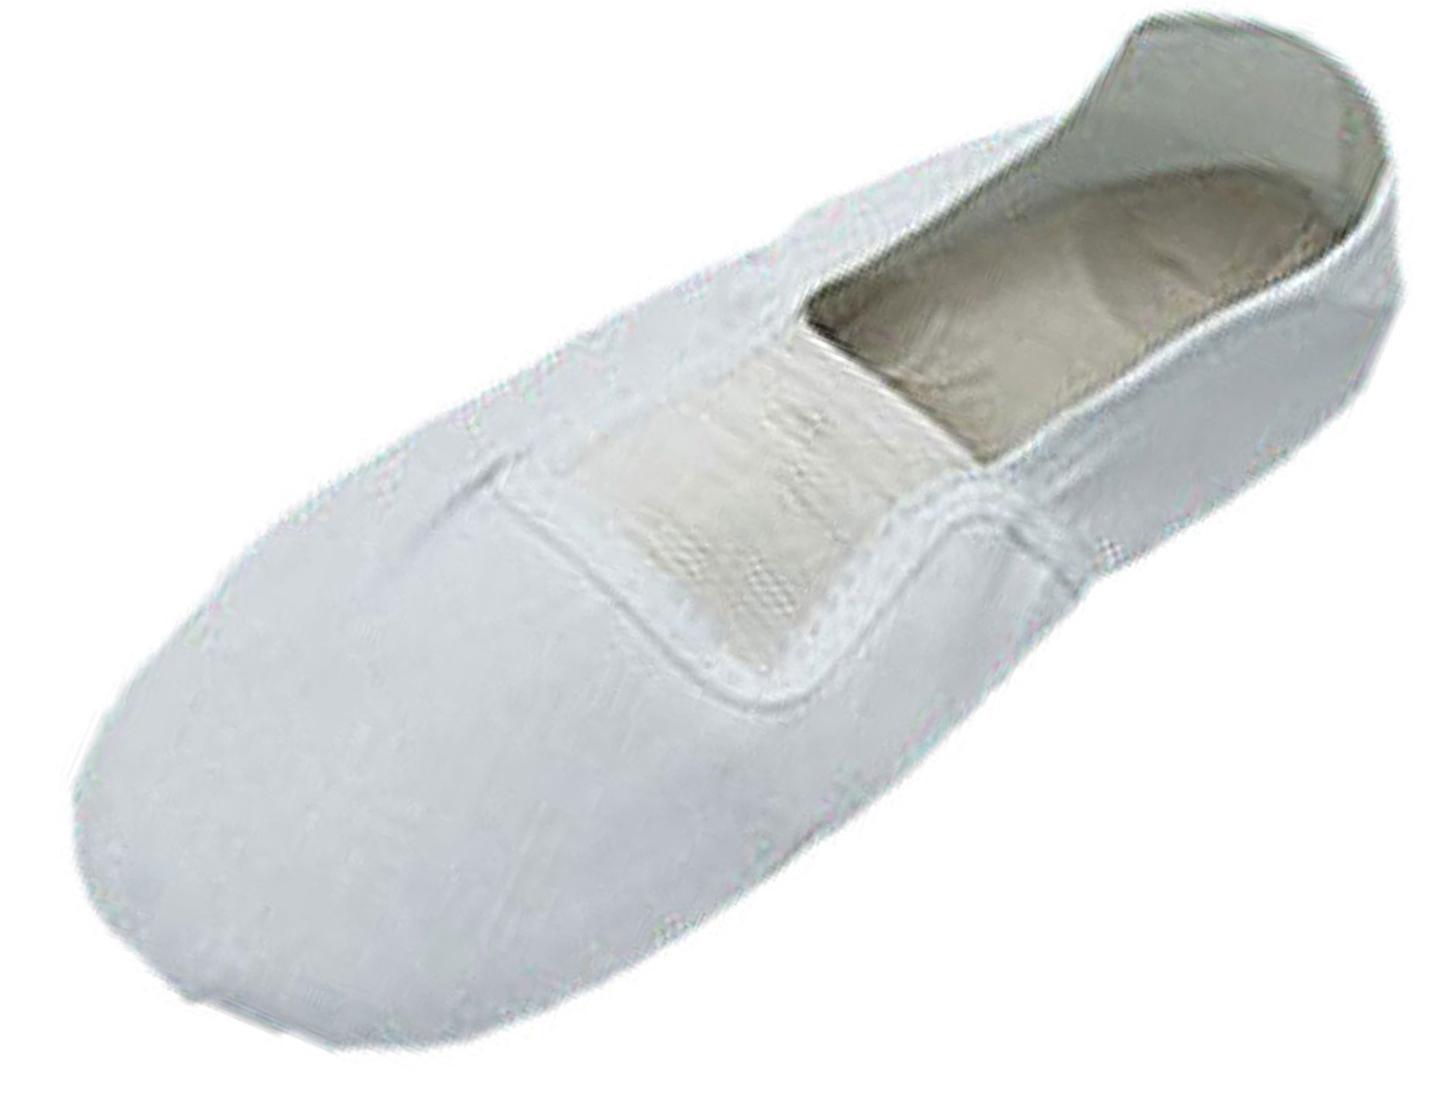 Elastic Band White Dancing Dance Shoes Size 11.5 Fjwex